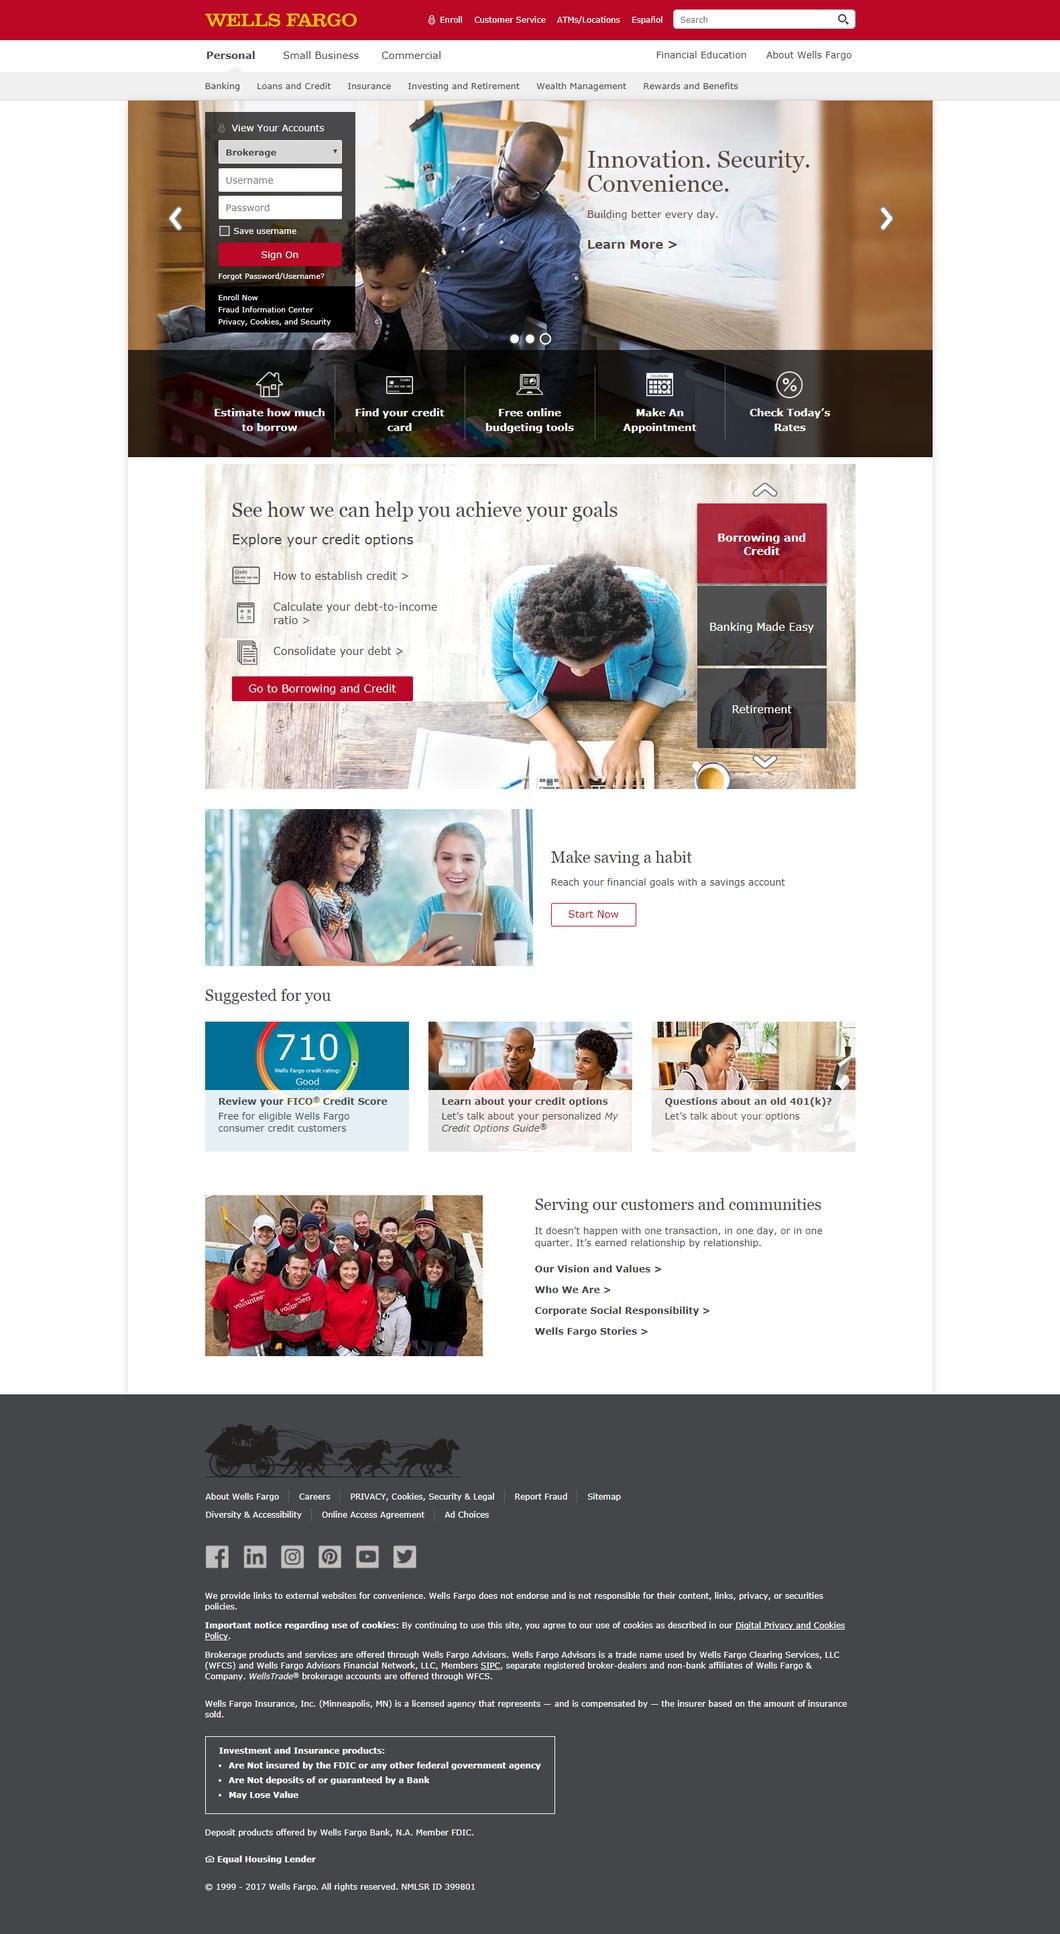 Wellstrade By Wells Fargo Platform Walkthrough 2018 Investopedia